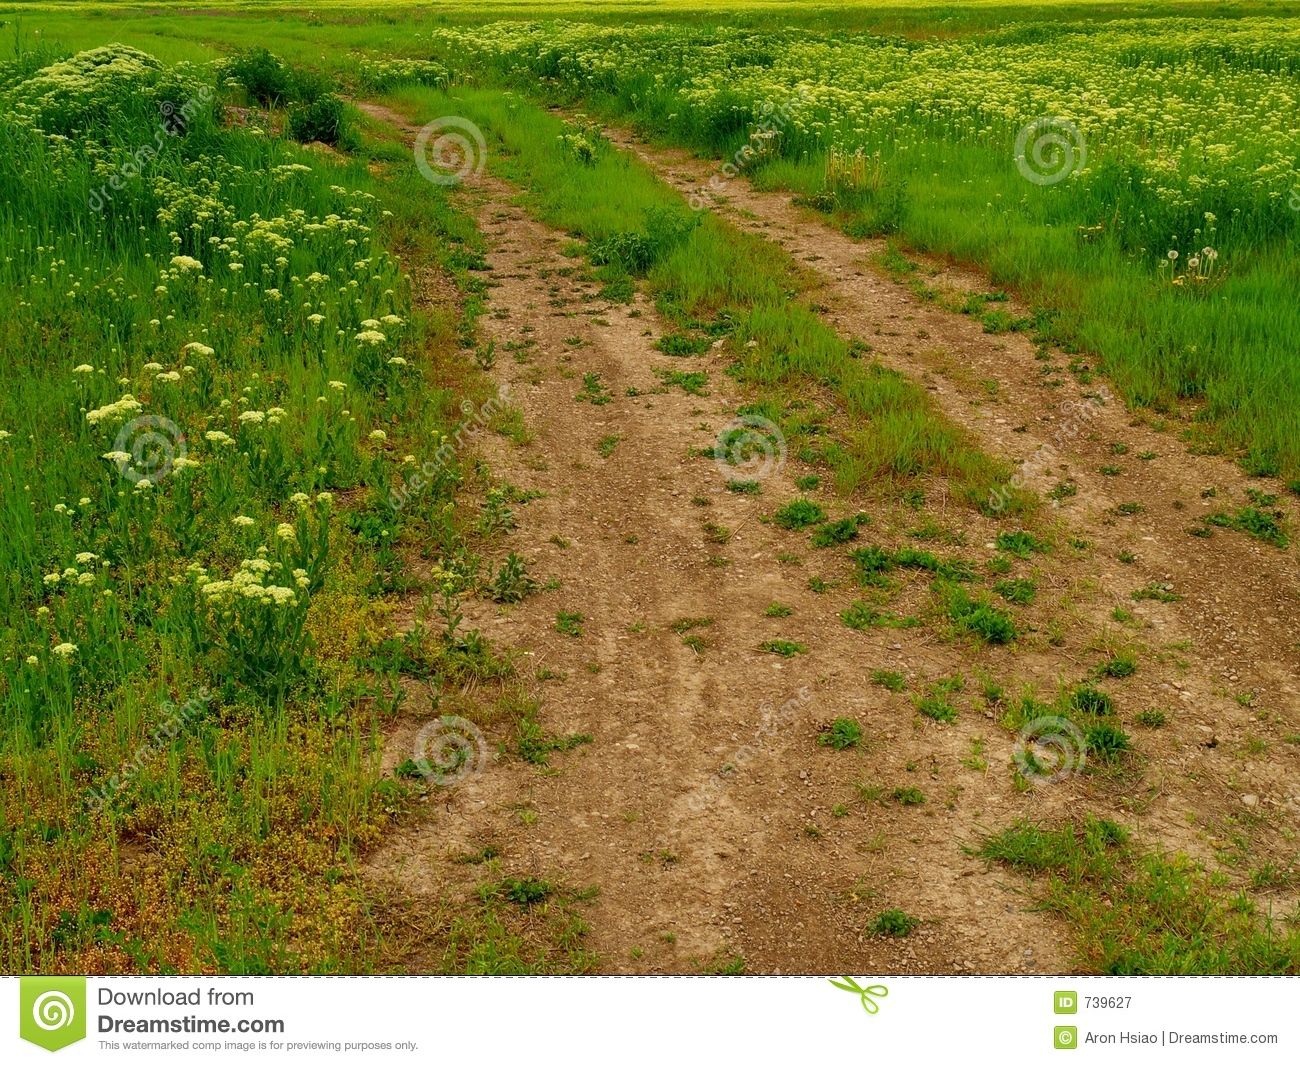 Dirt Path Clip Art Long Tail Keywords.